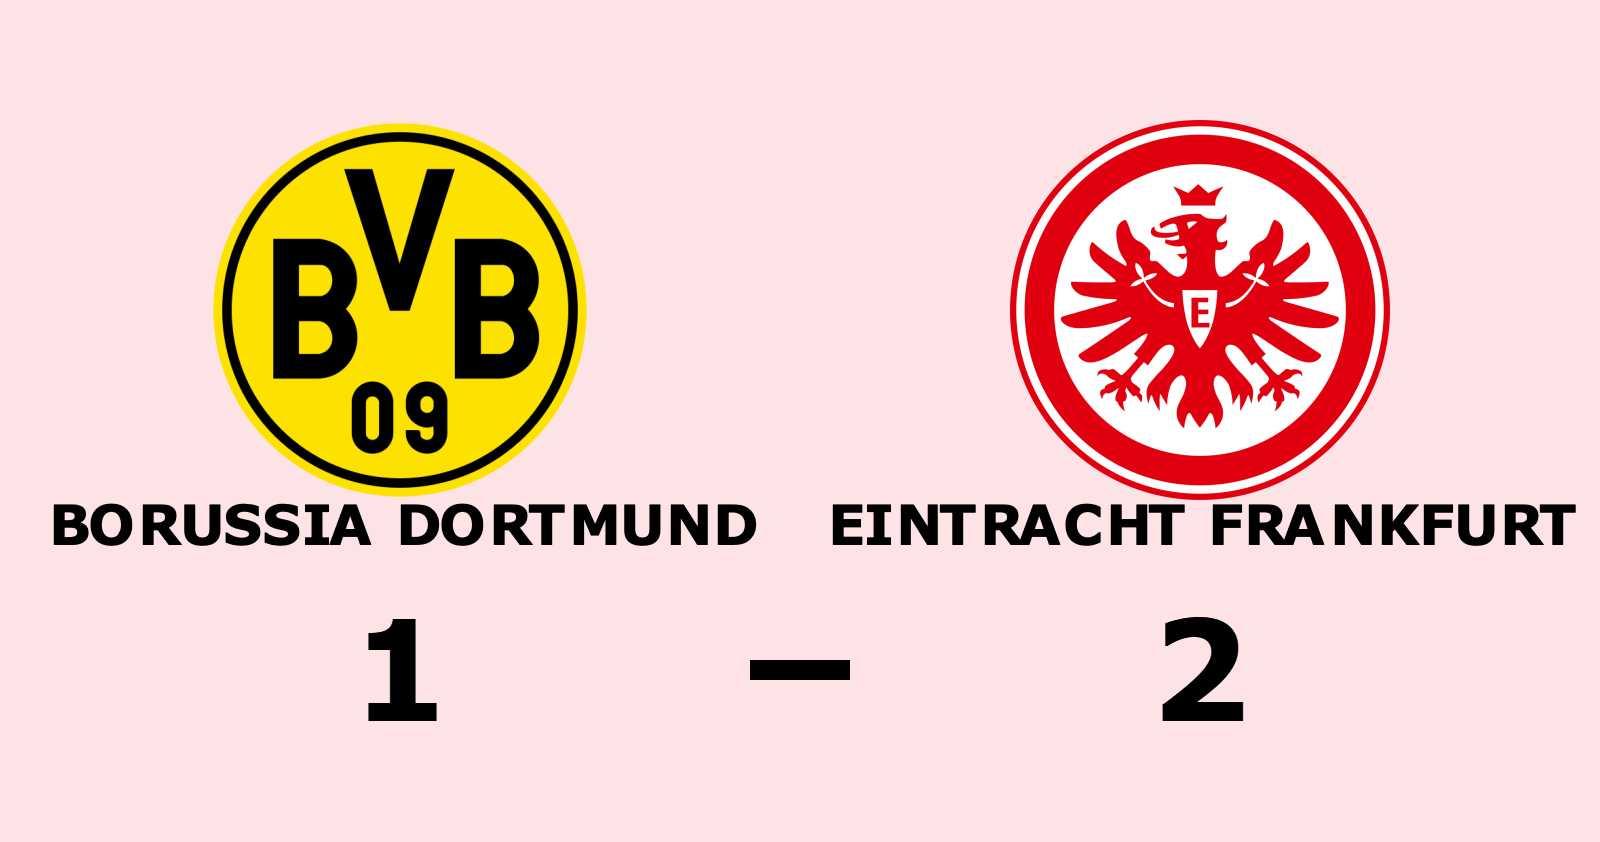 Eintracht Frankfurt slog Borussia Dortmund borta